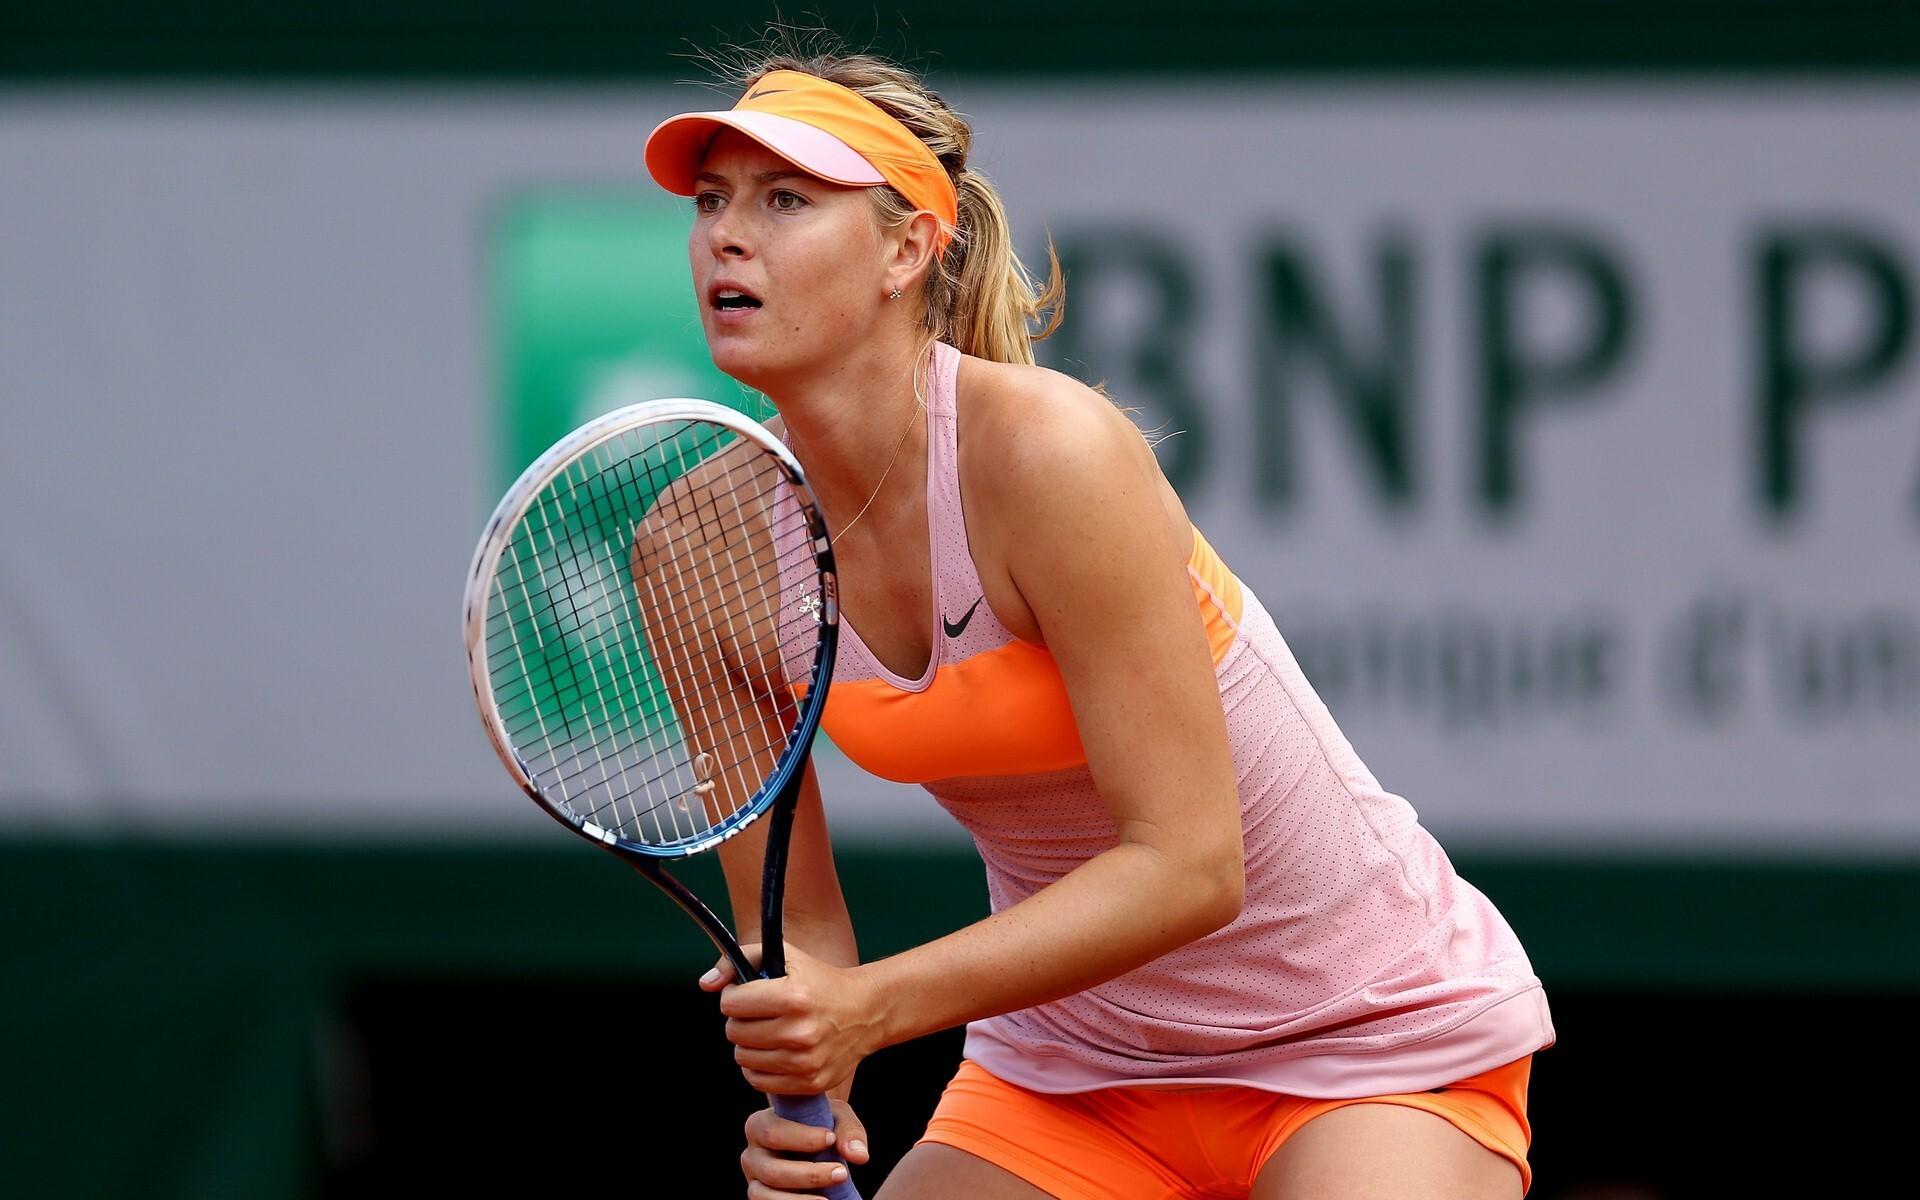 Maria Sharapova Tennis Player Hd Photo Hd Wallpapers